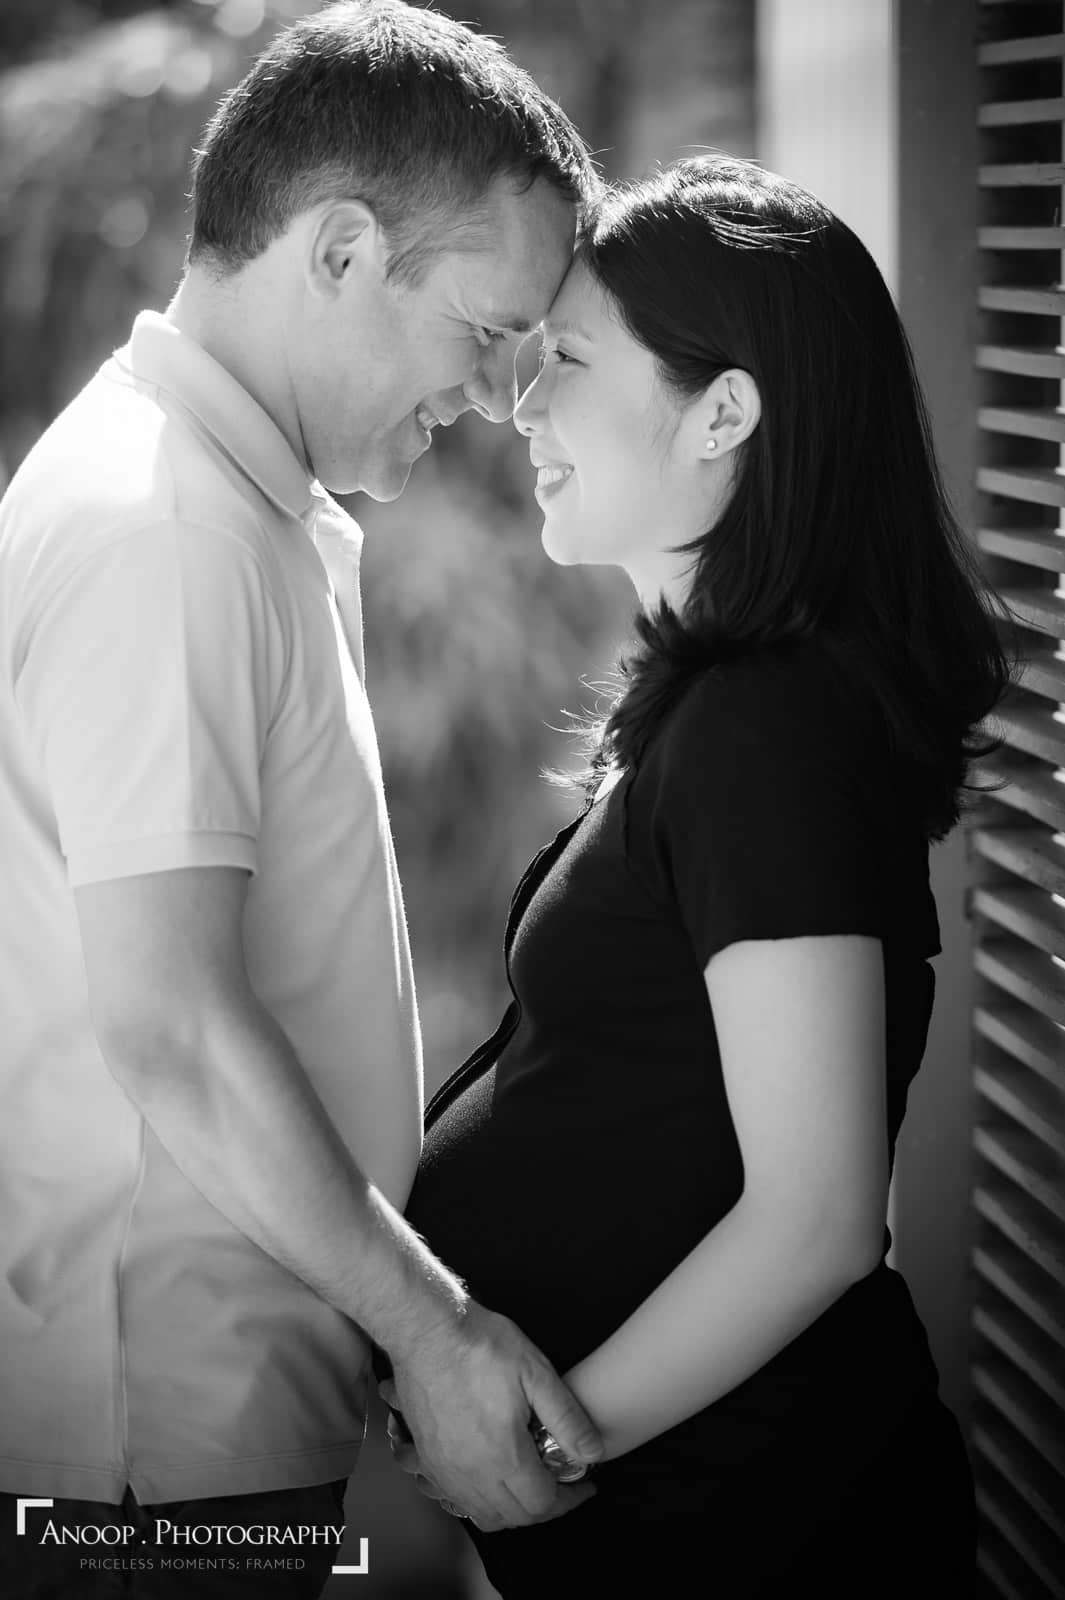 best-maternity-photographer-bangkok-thailand-009